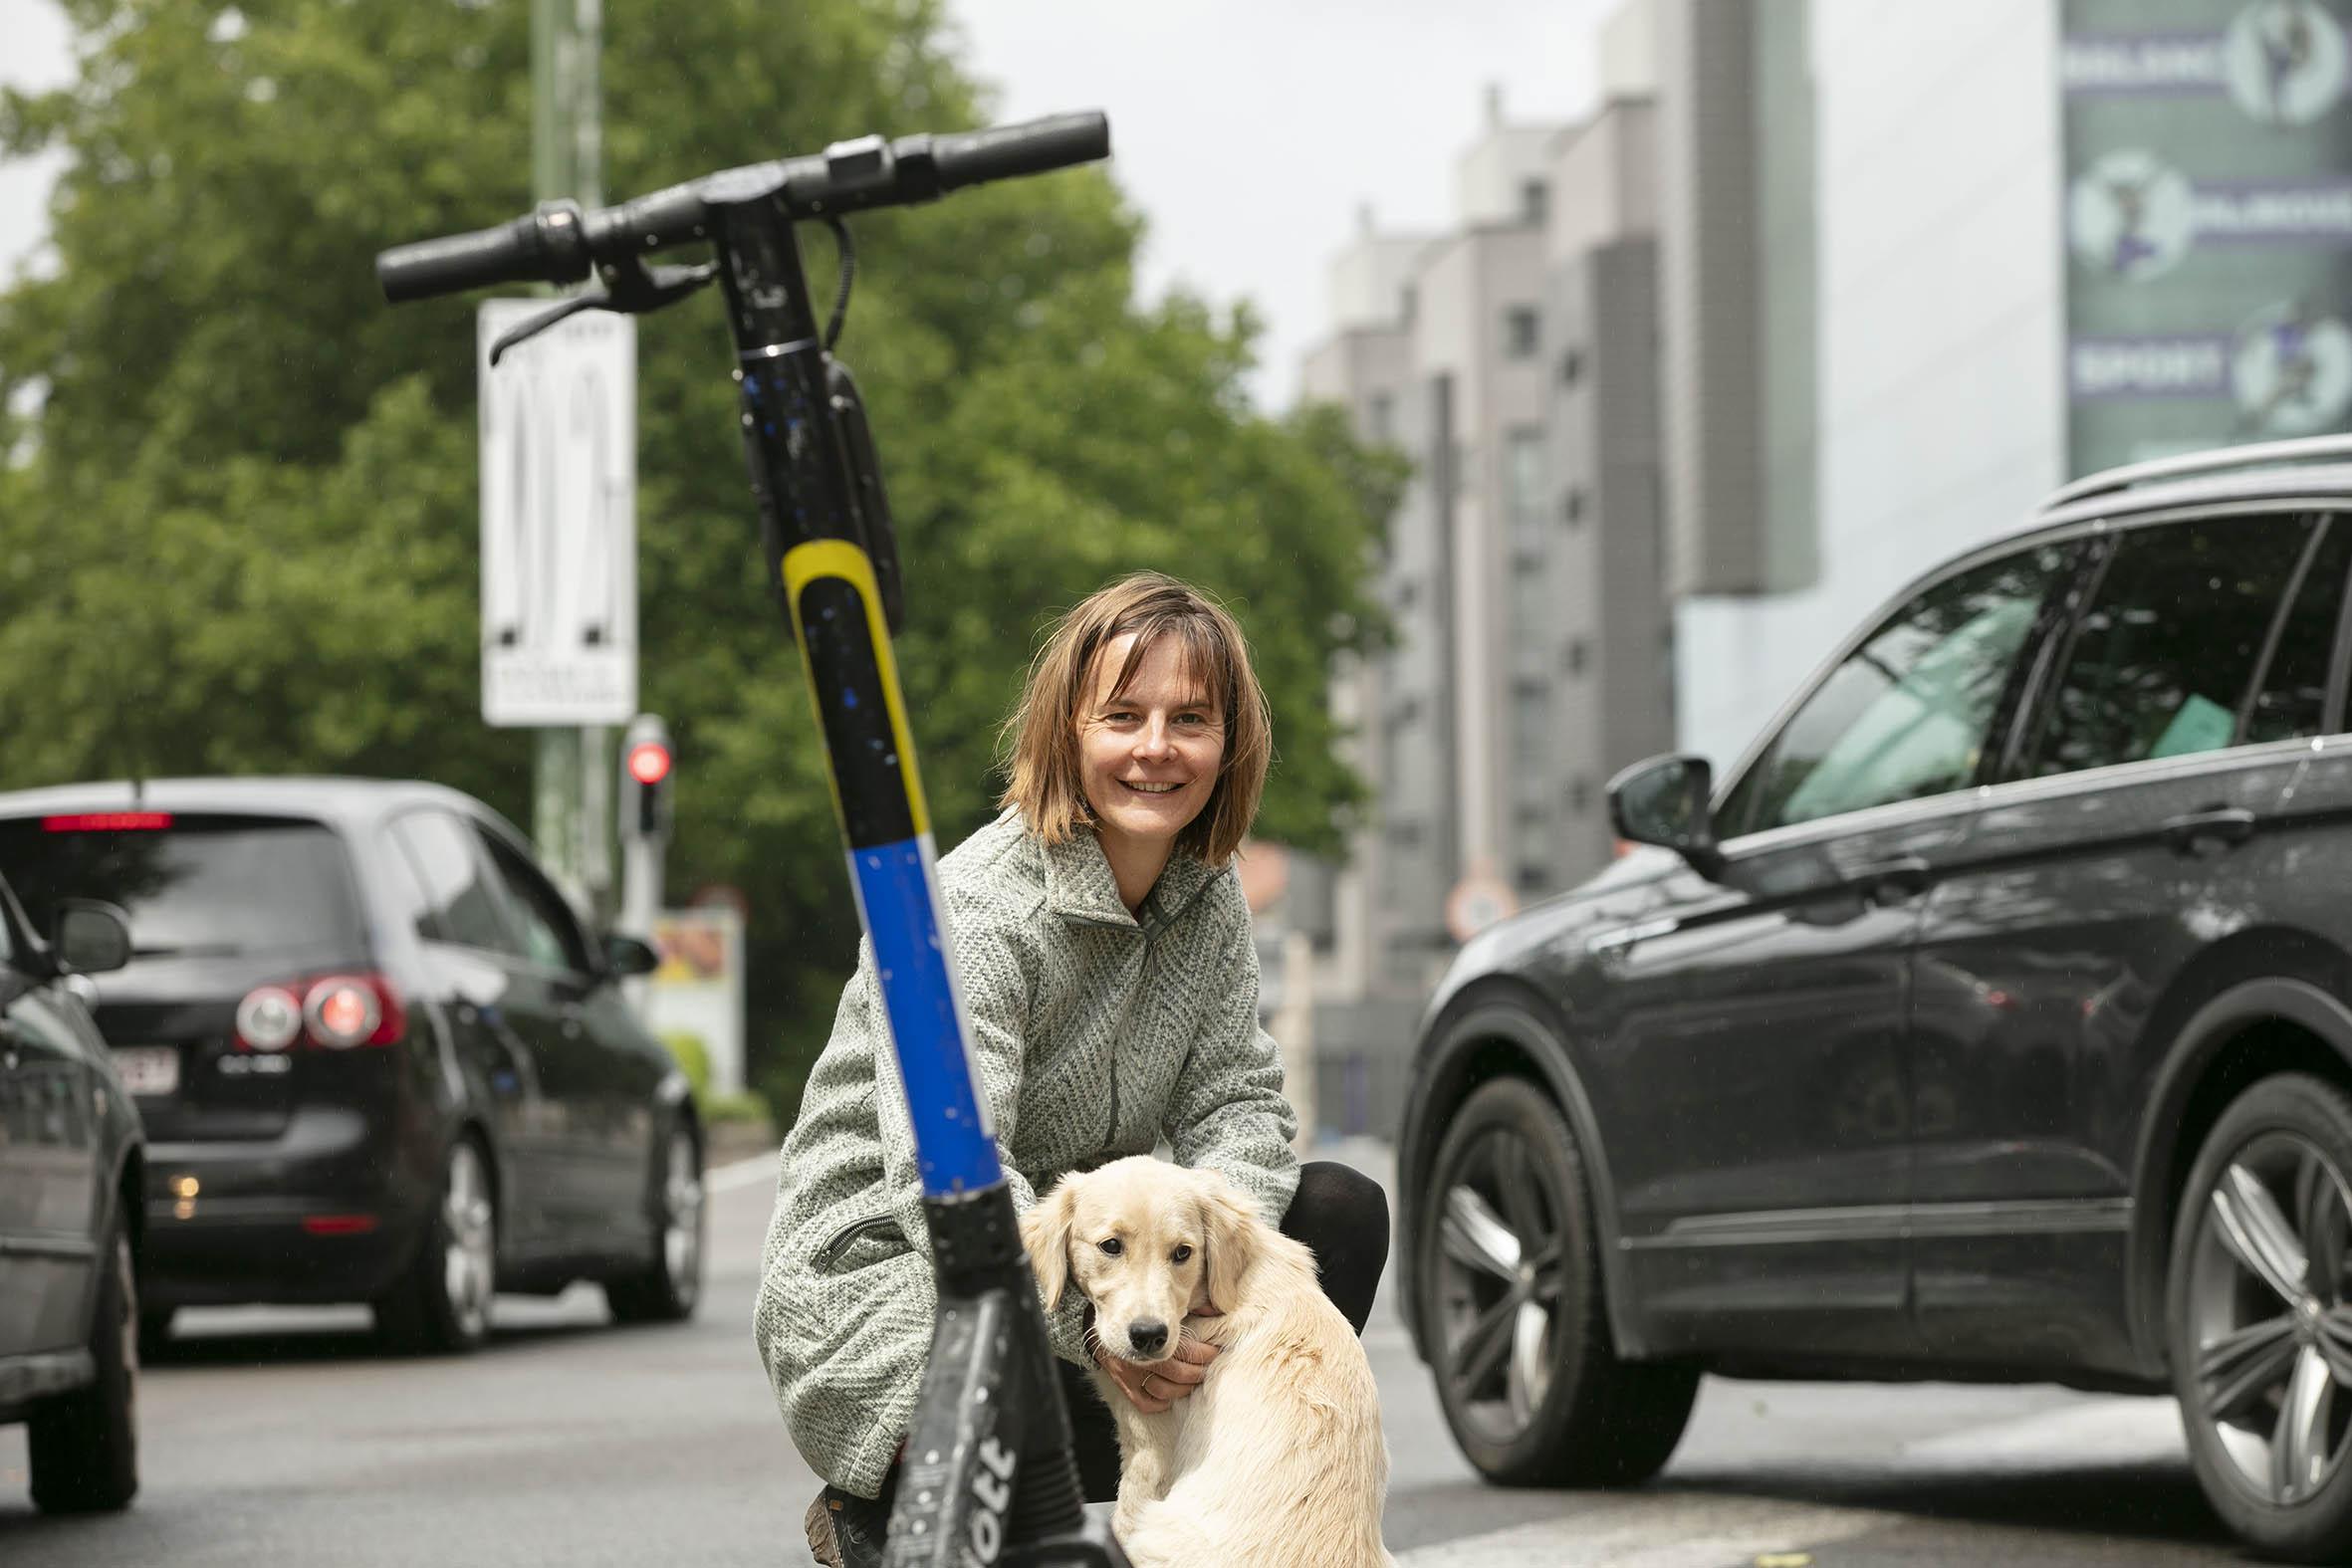 Cathy Macharis, over mobiliteit en coronaVVSG Lokaal